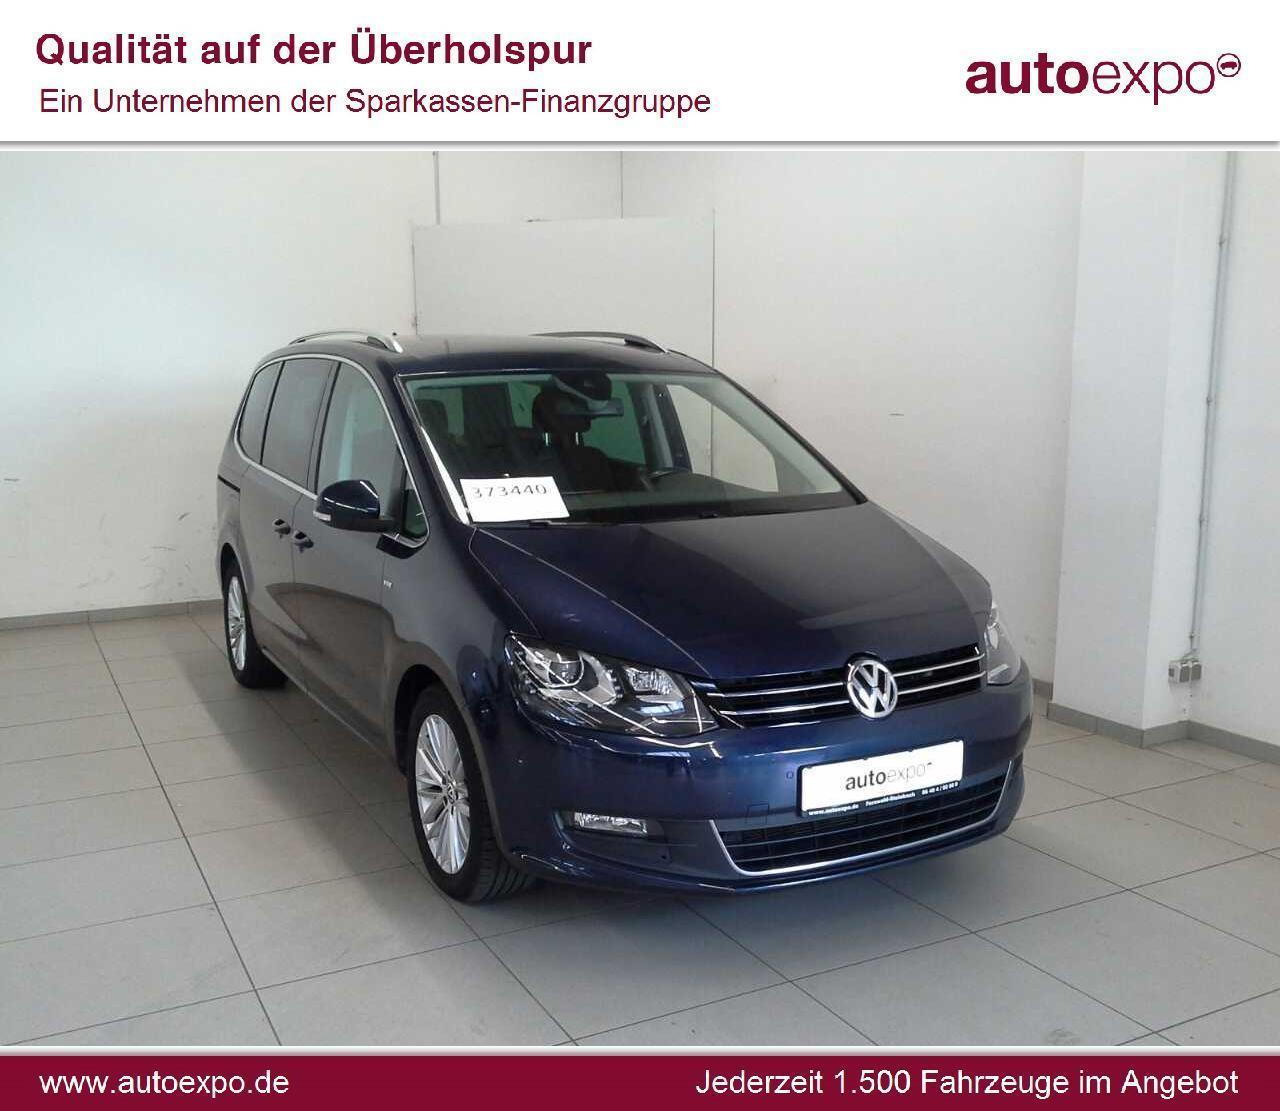 VW Sharan 2.0 TDI Cup Xenon AHK